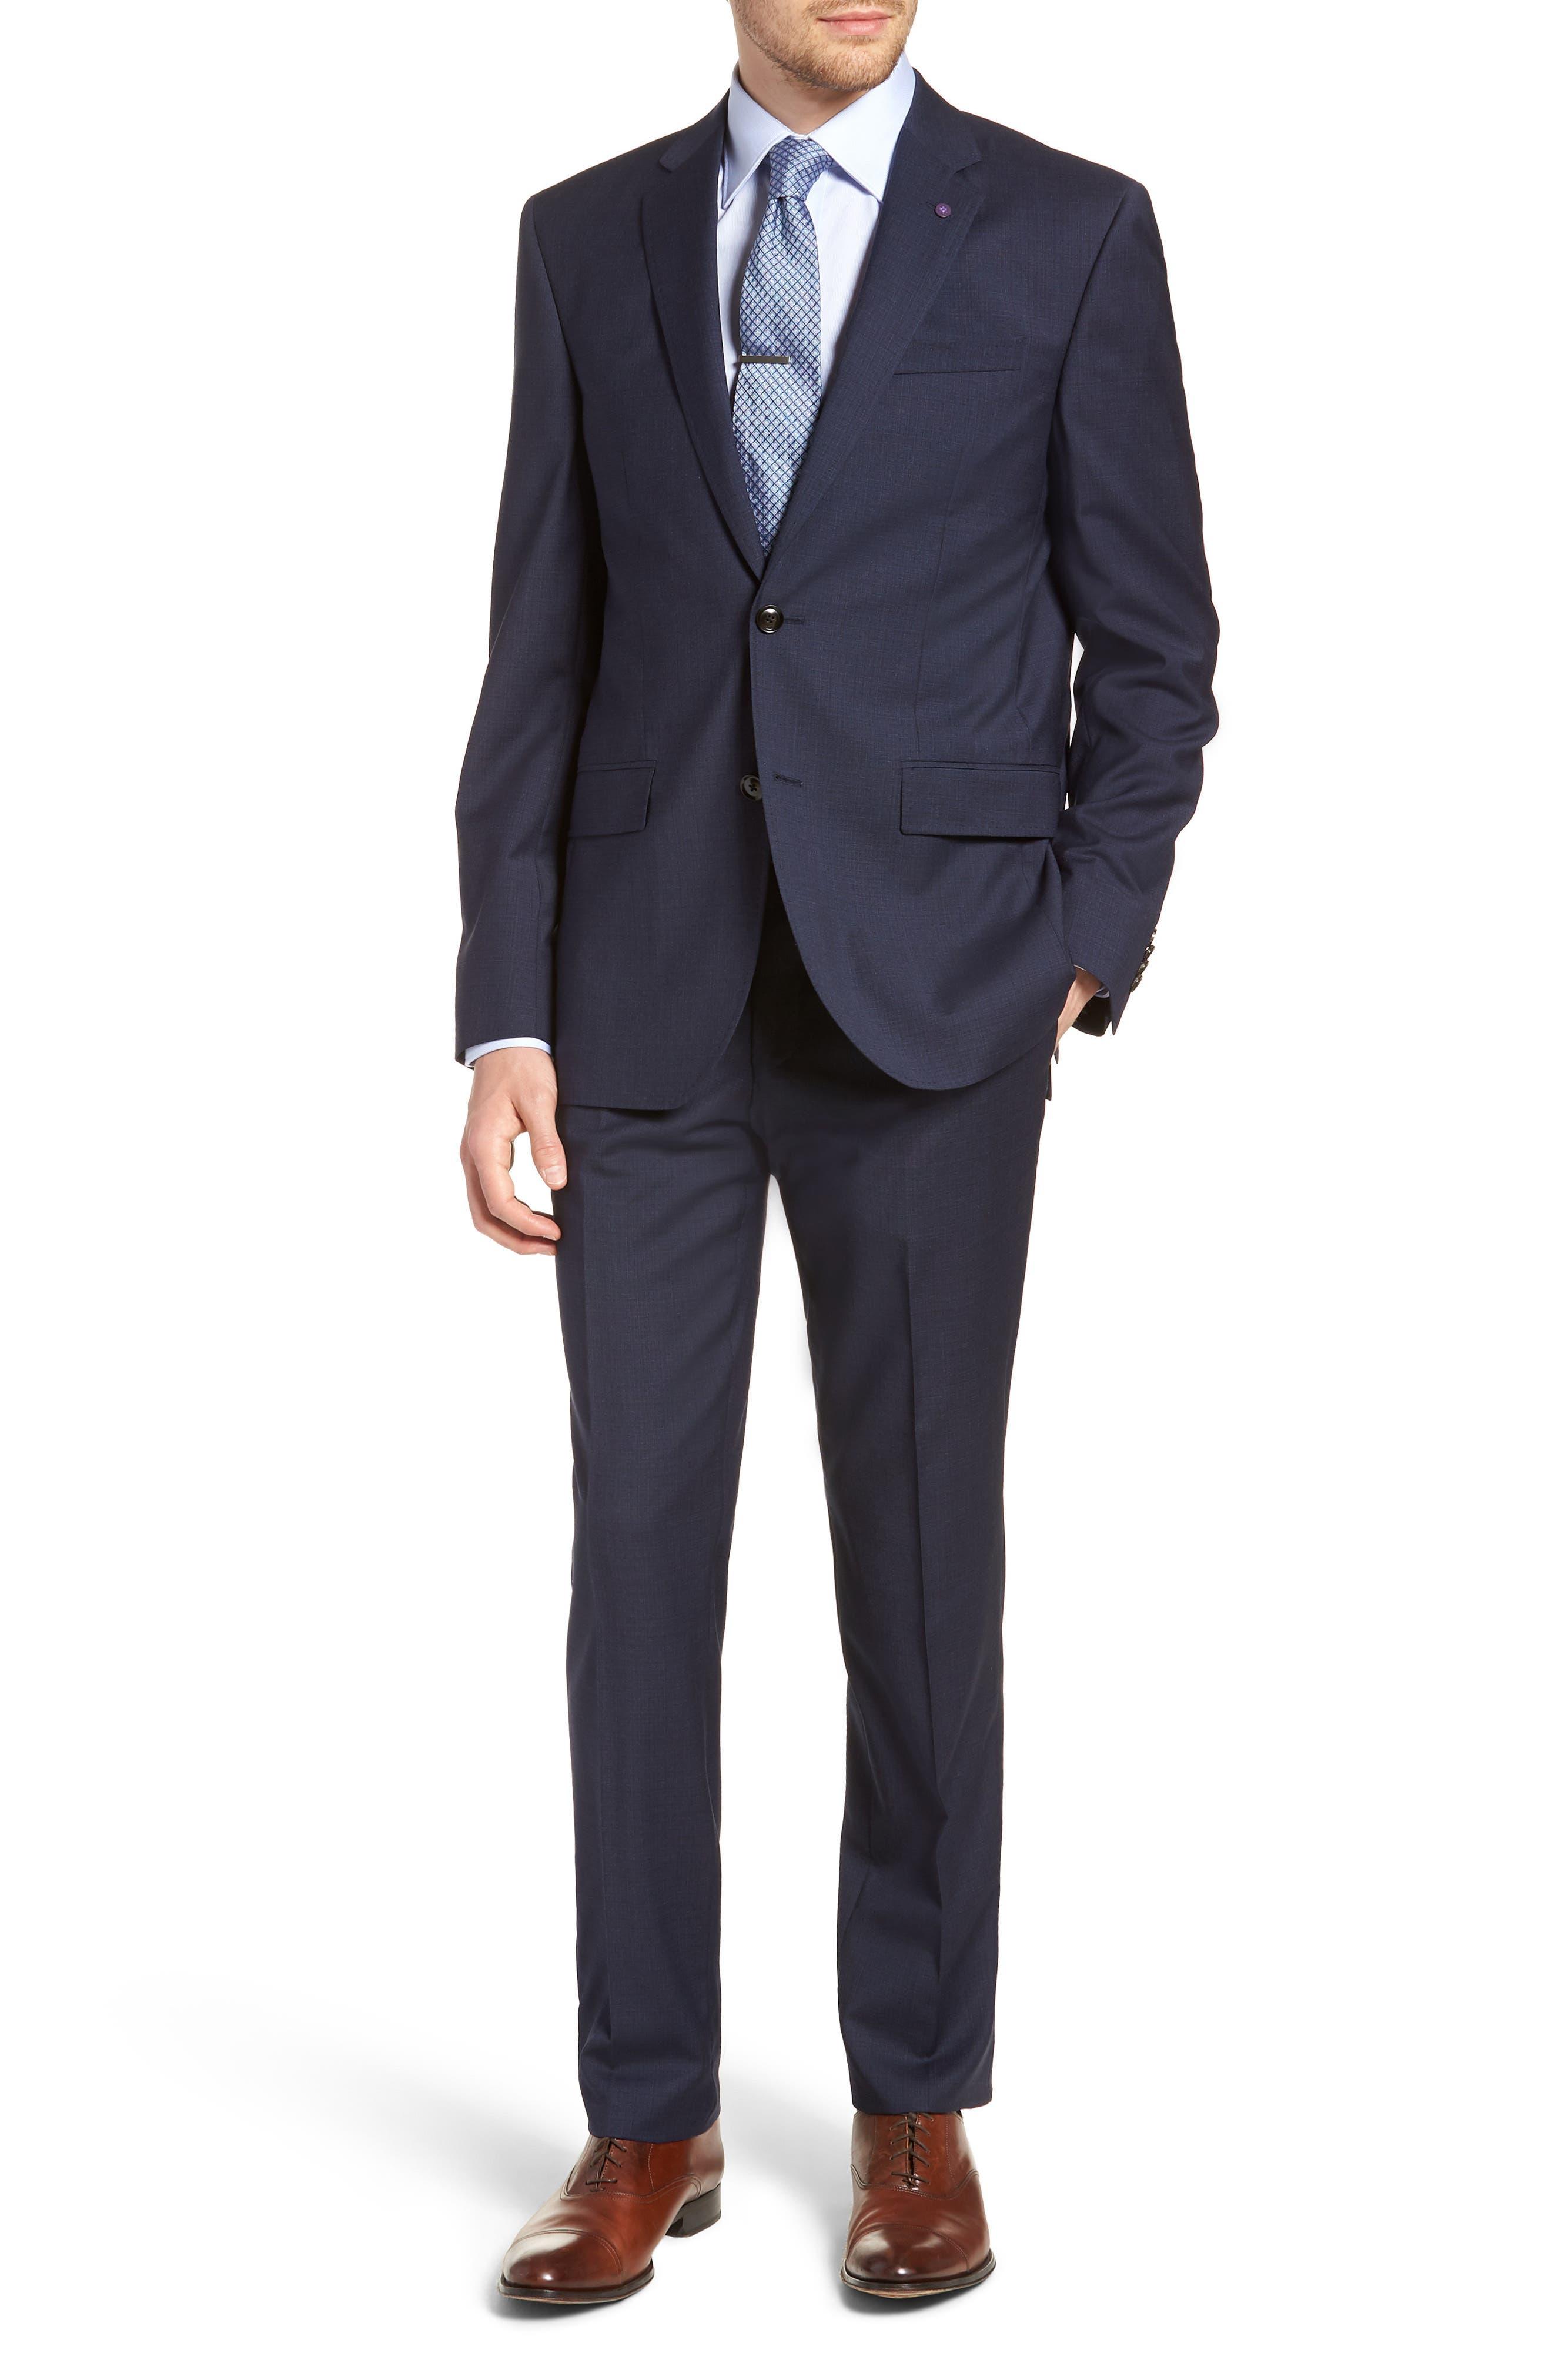 Jay Trim Fit Solid Wool Suit,                             Main thumbnail 1, color,                             400